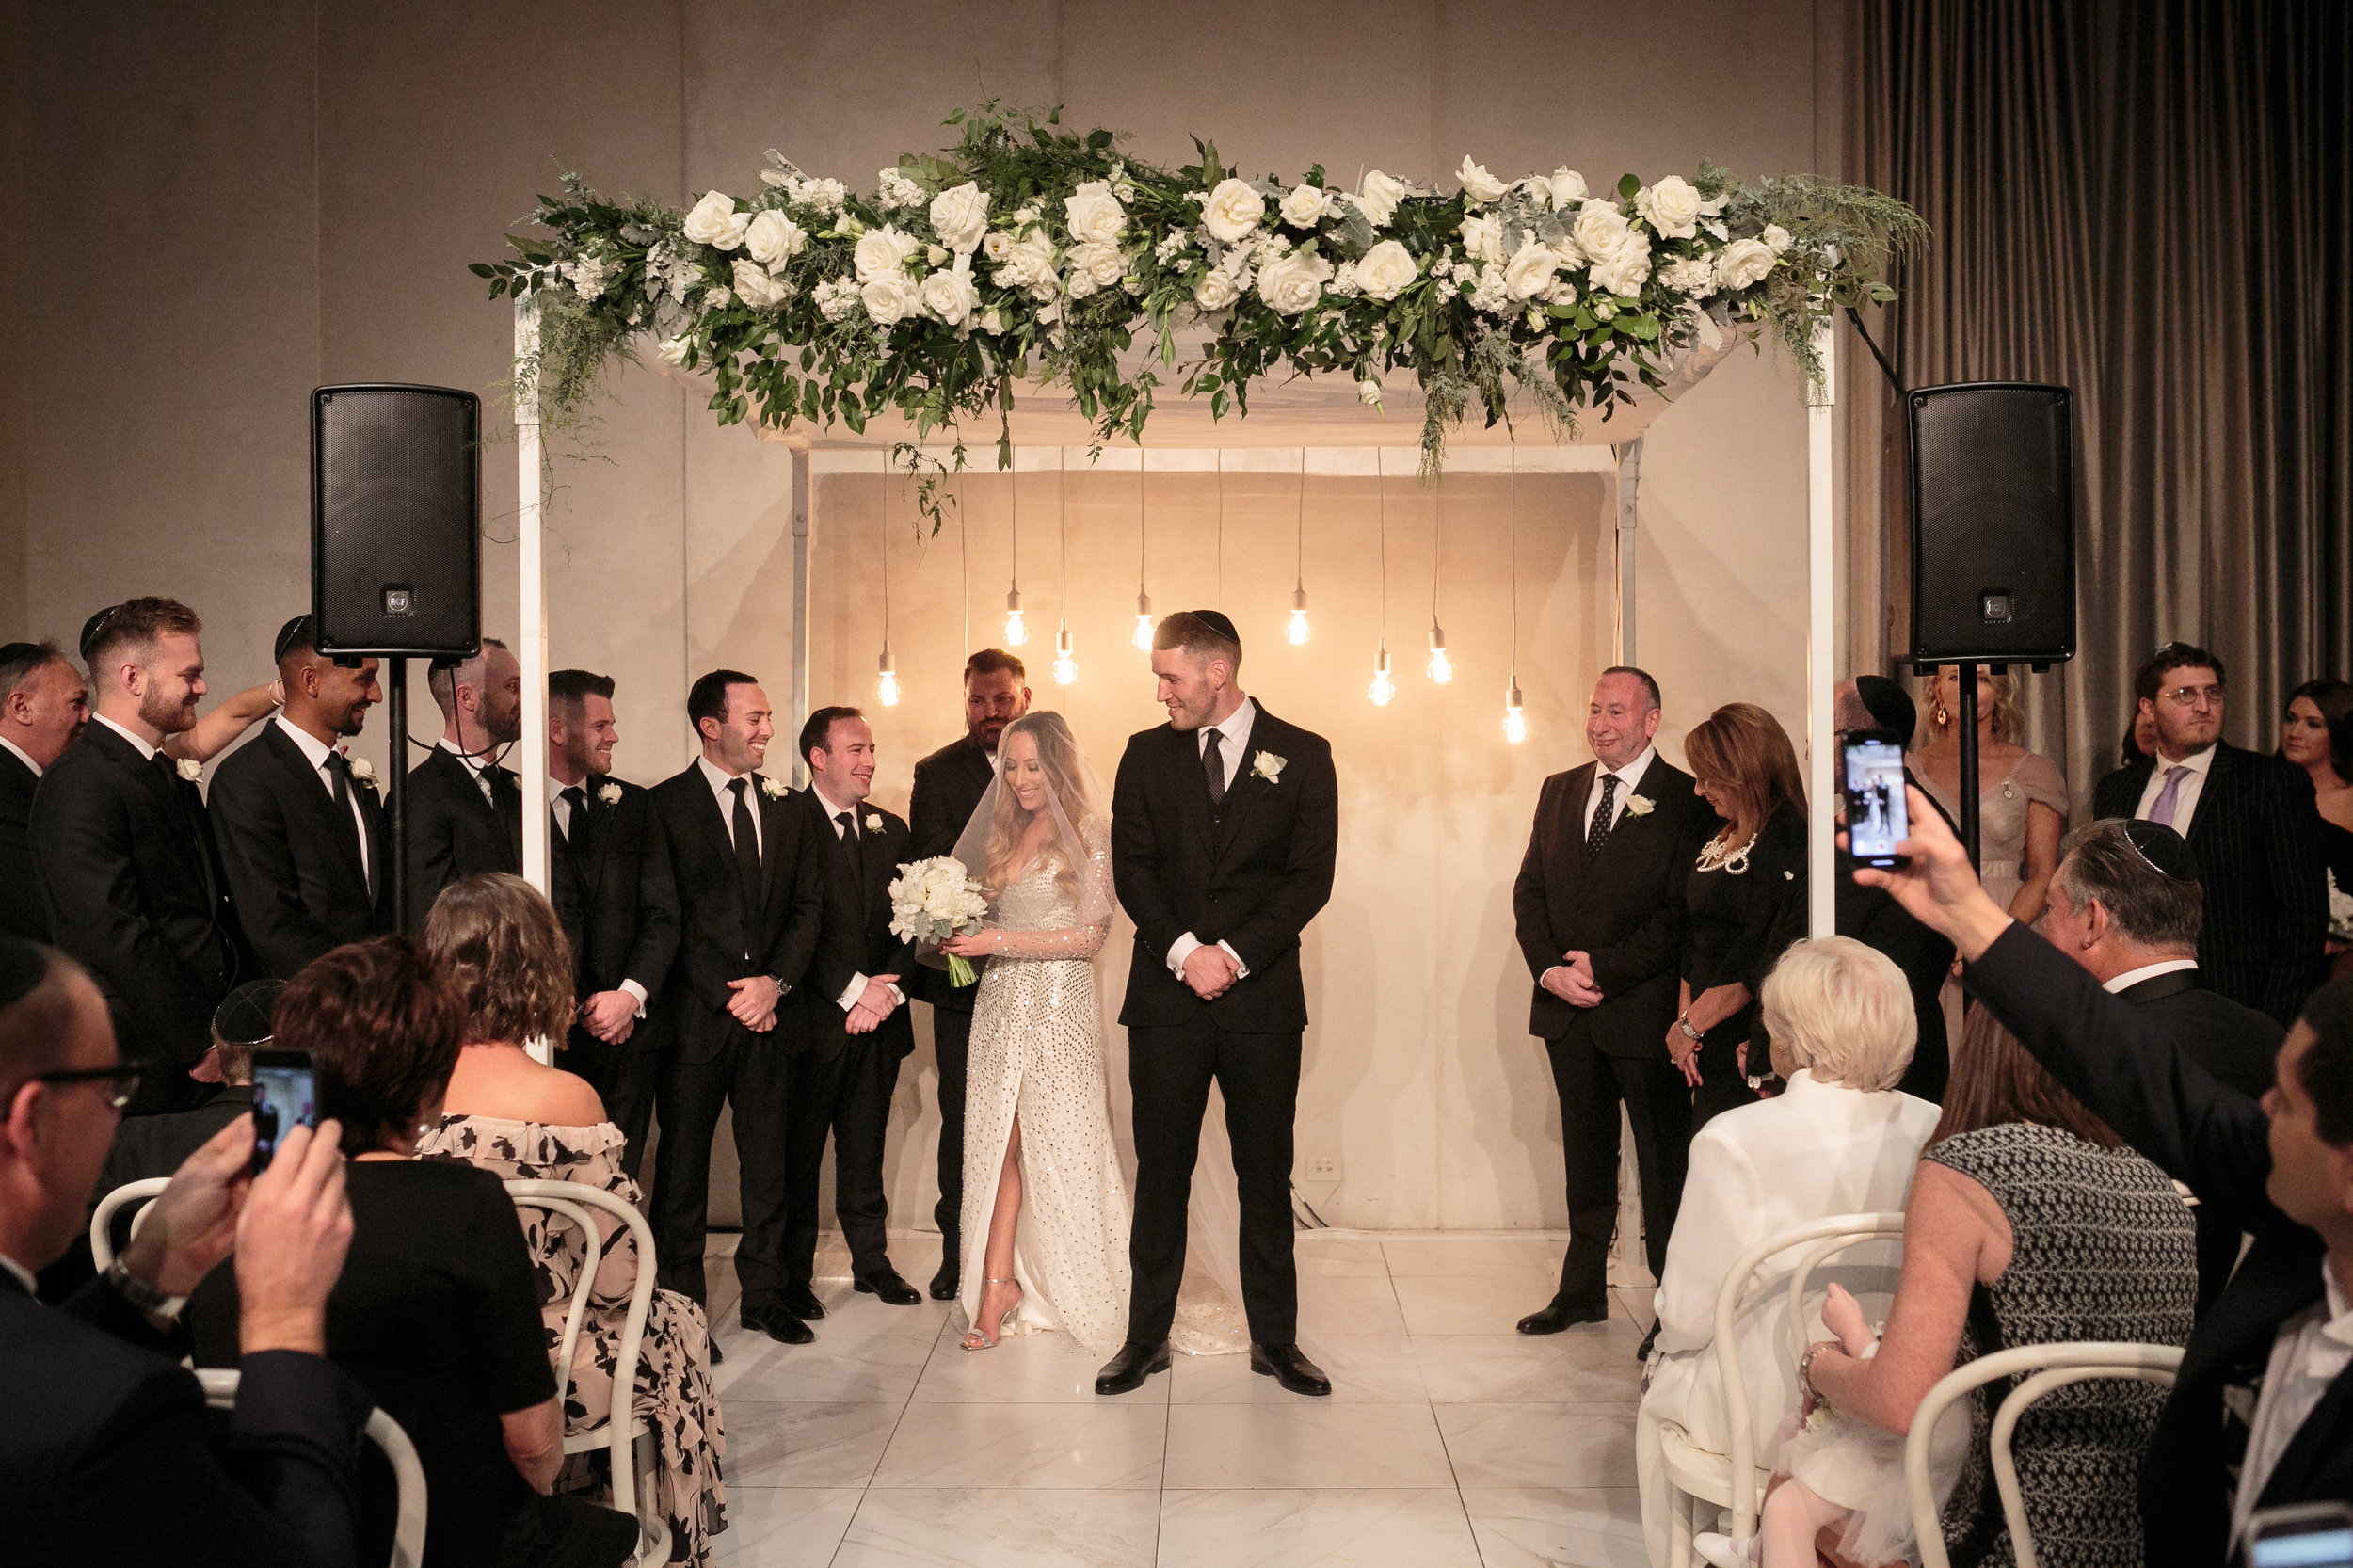 JEREMY-BLODE-Liza + James Wedding Highlights-63.jpg